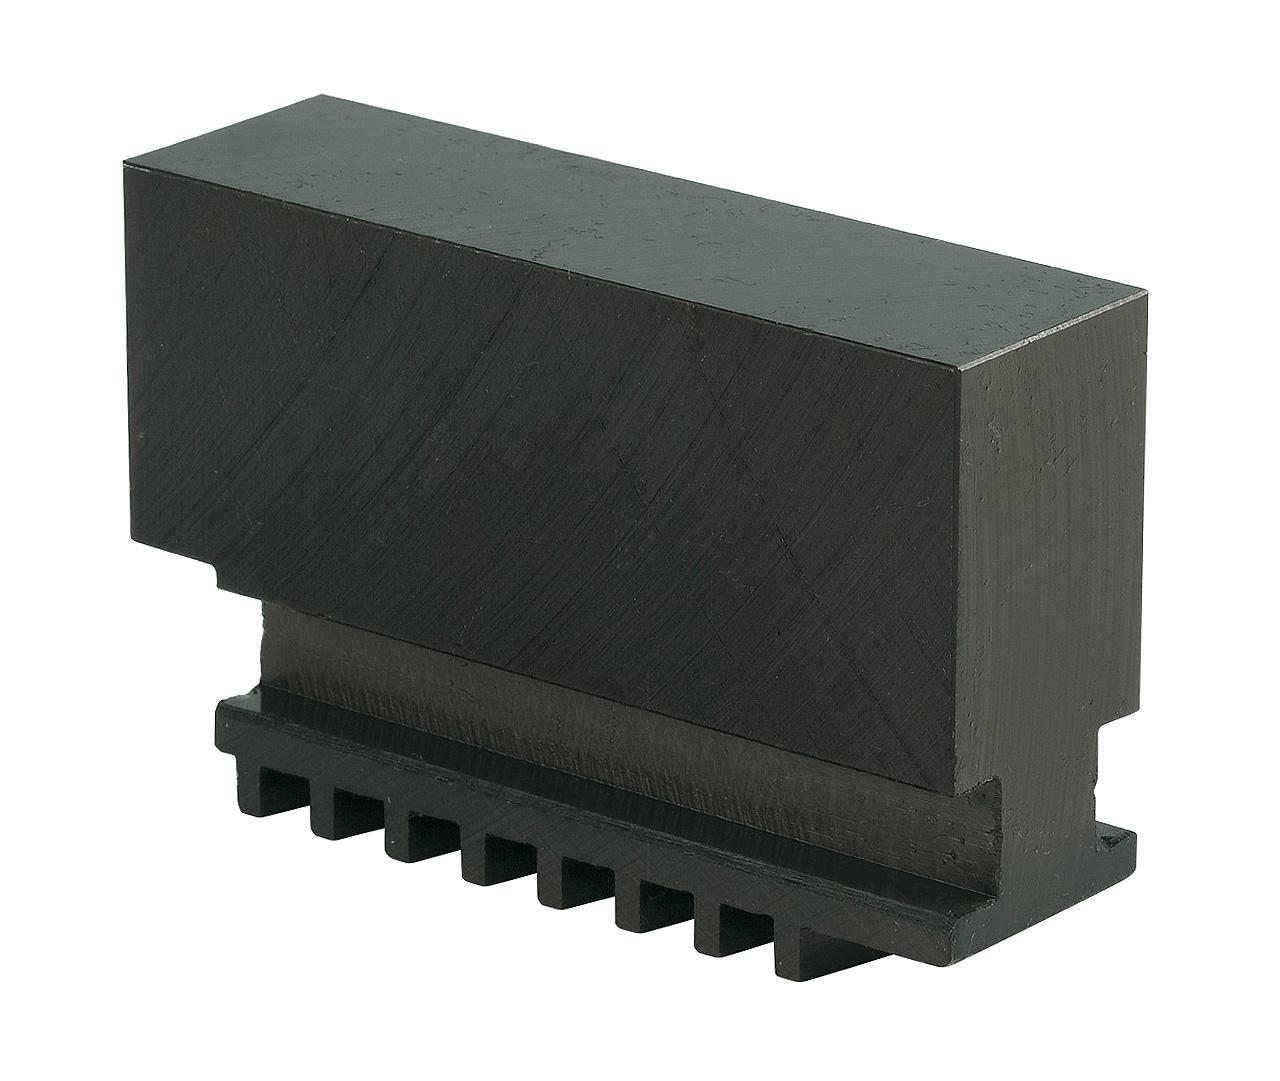 Szczęki jednolite miękkie - komplet DSJ-DK12-315 BERNARDO